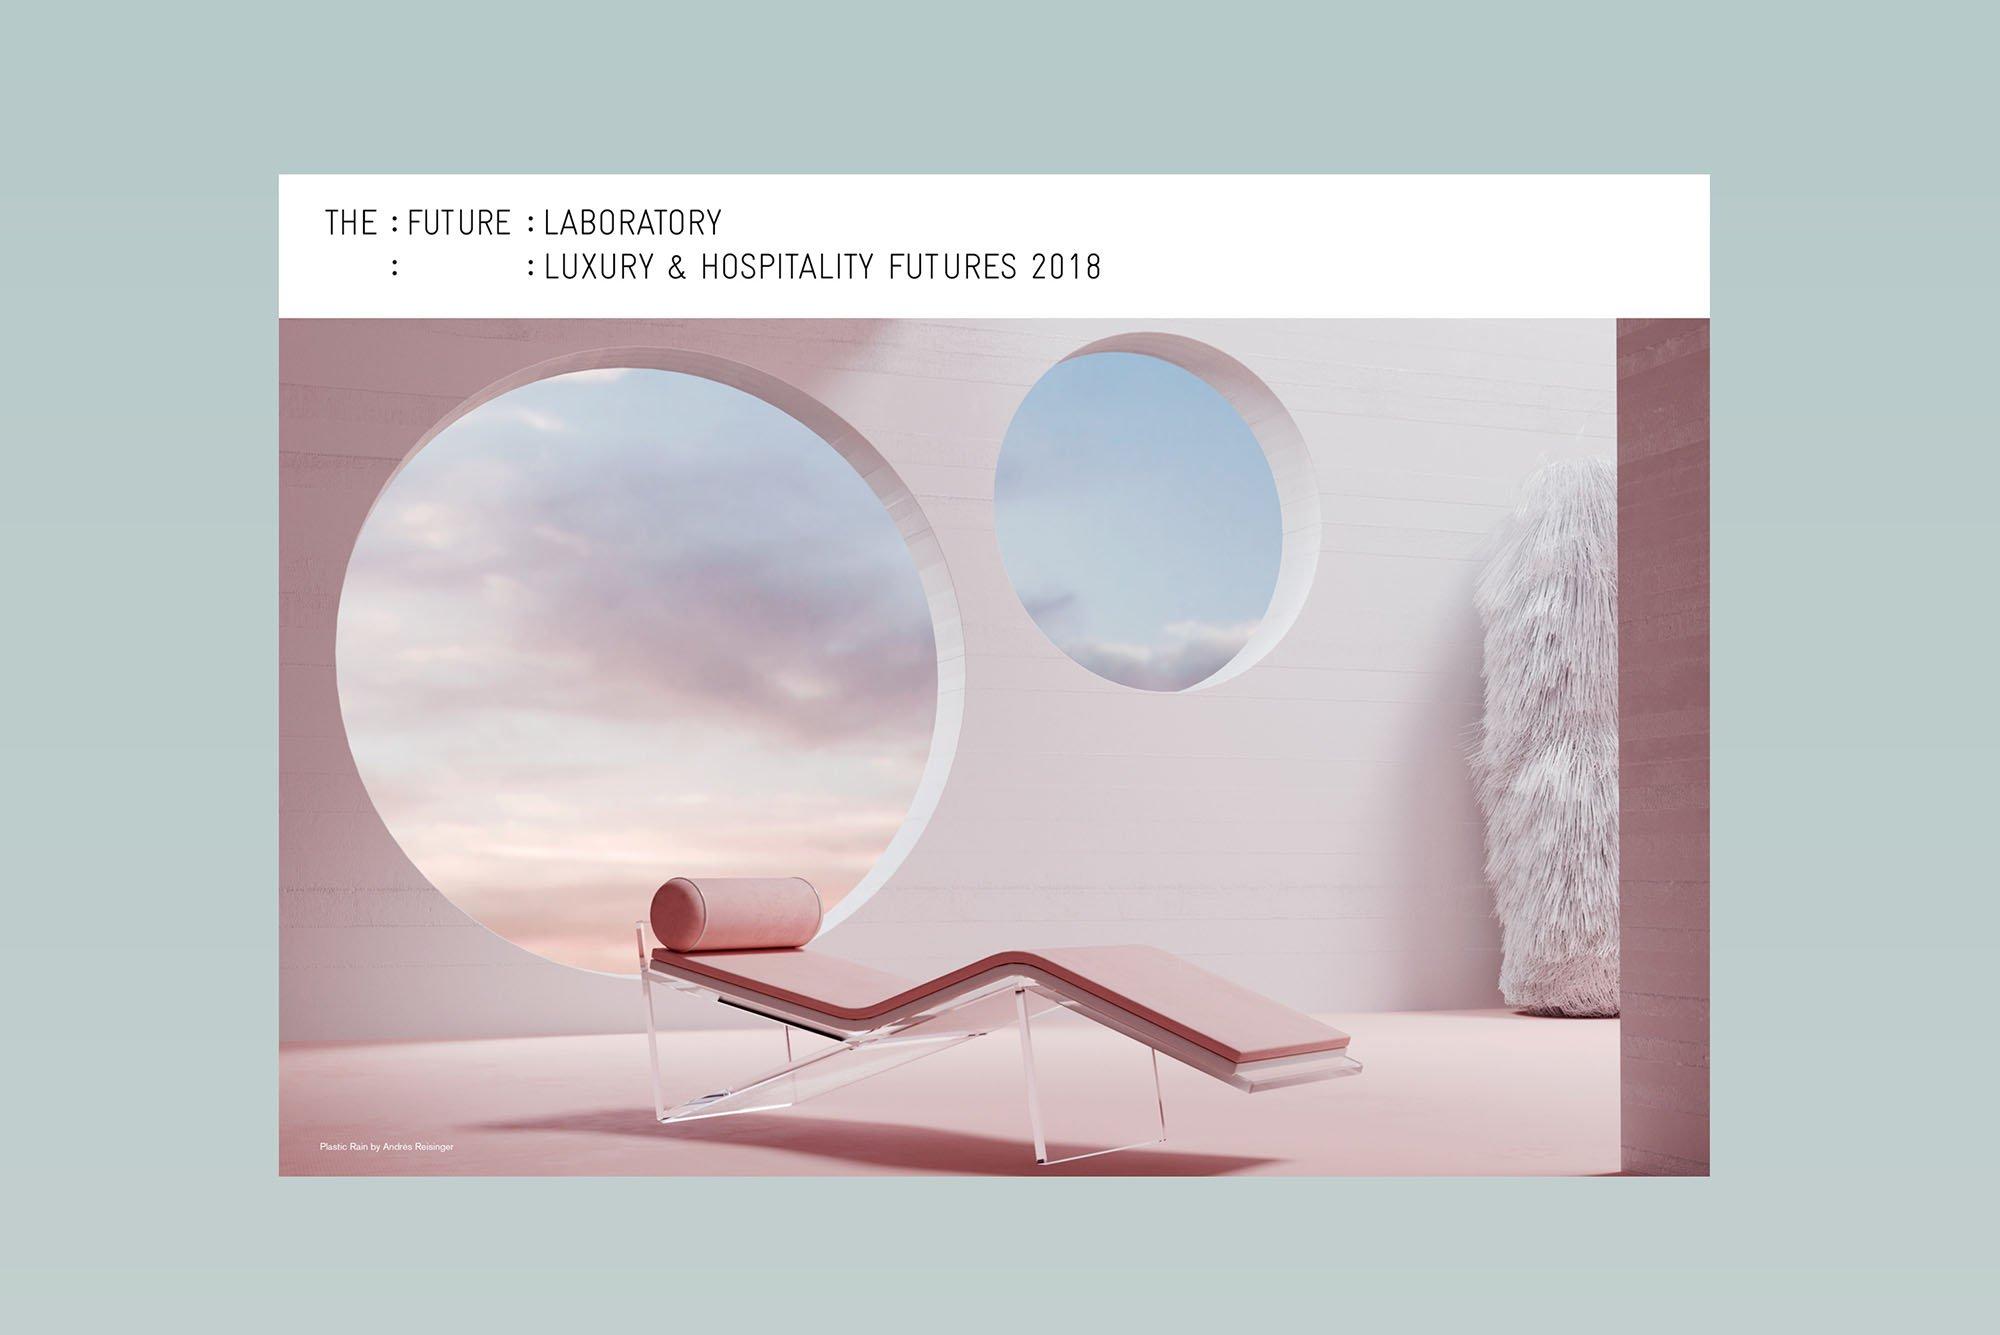 Landing-report-images-LUX_0